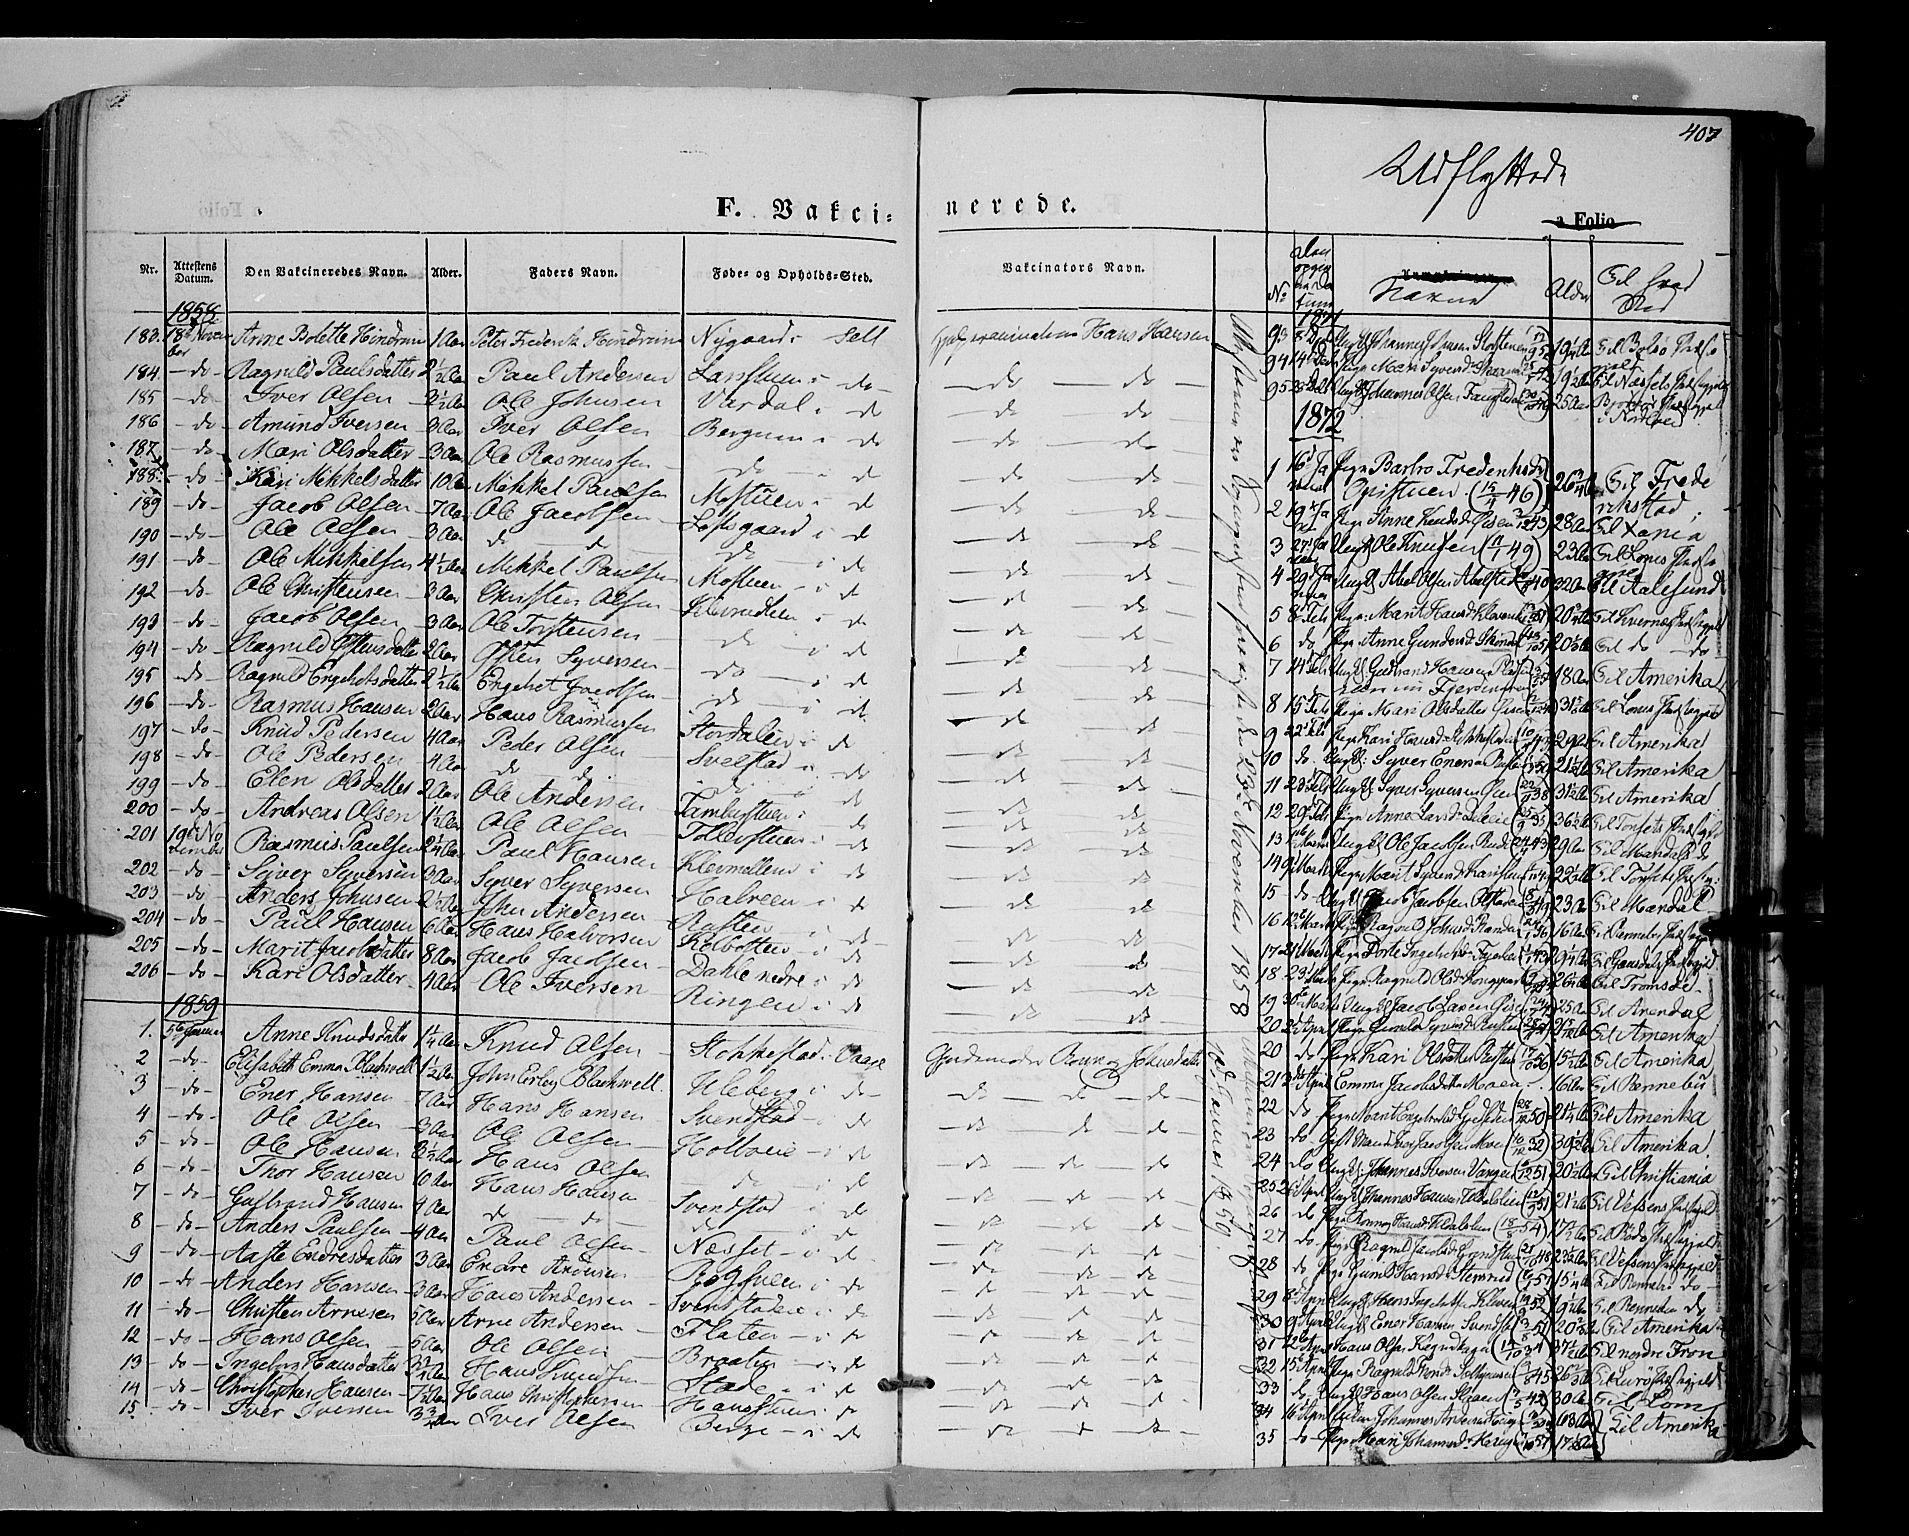 SAH, Vågå prestekontor, Ministerialbok nr. 6 /1, 1856-1872, s. 407